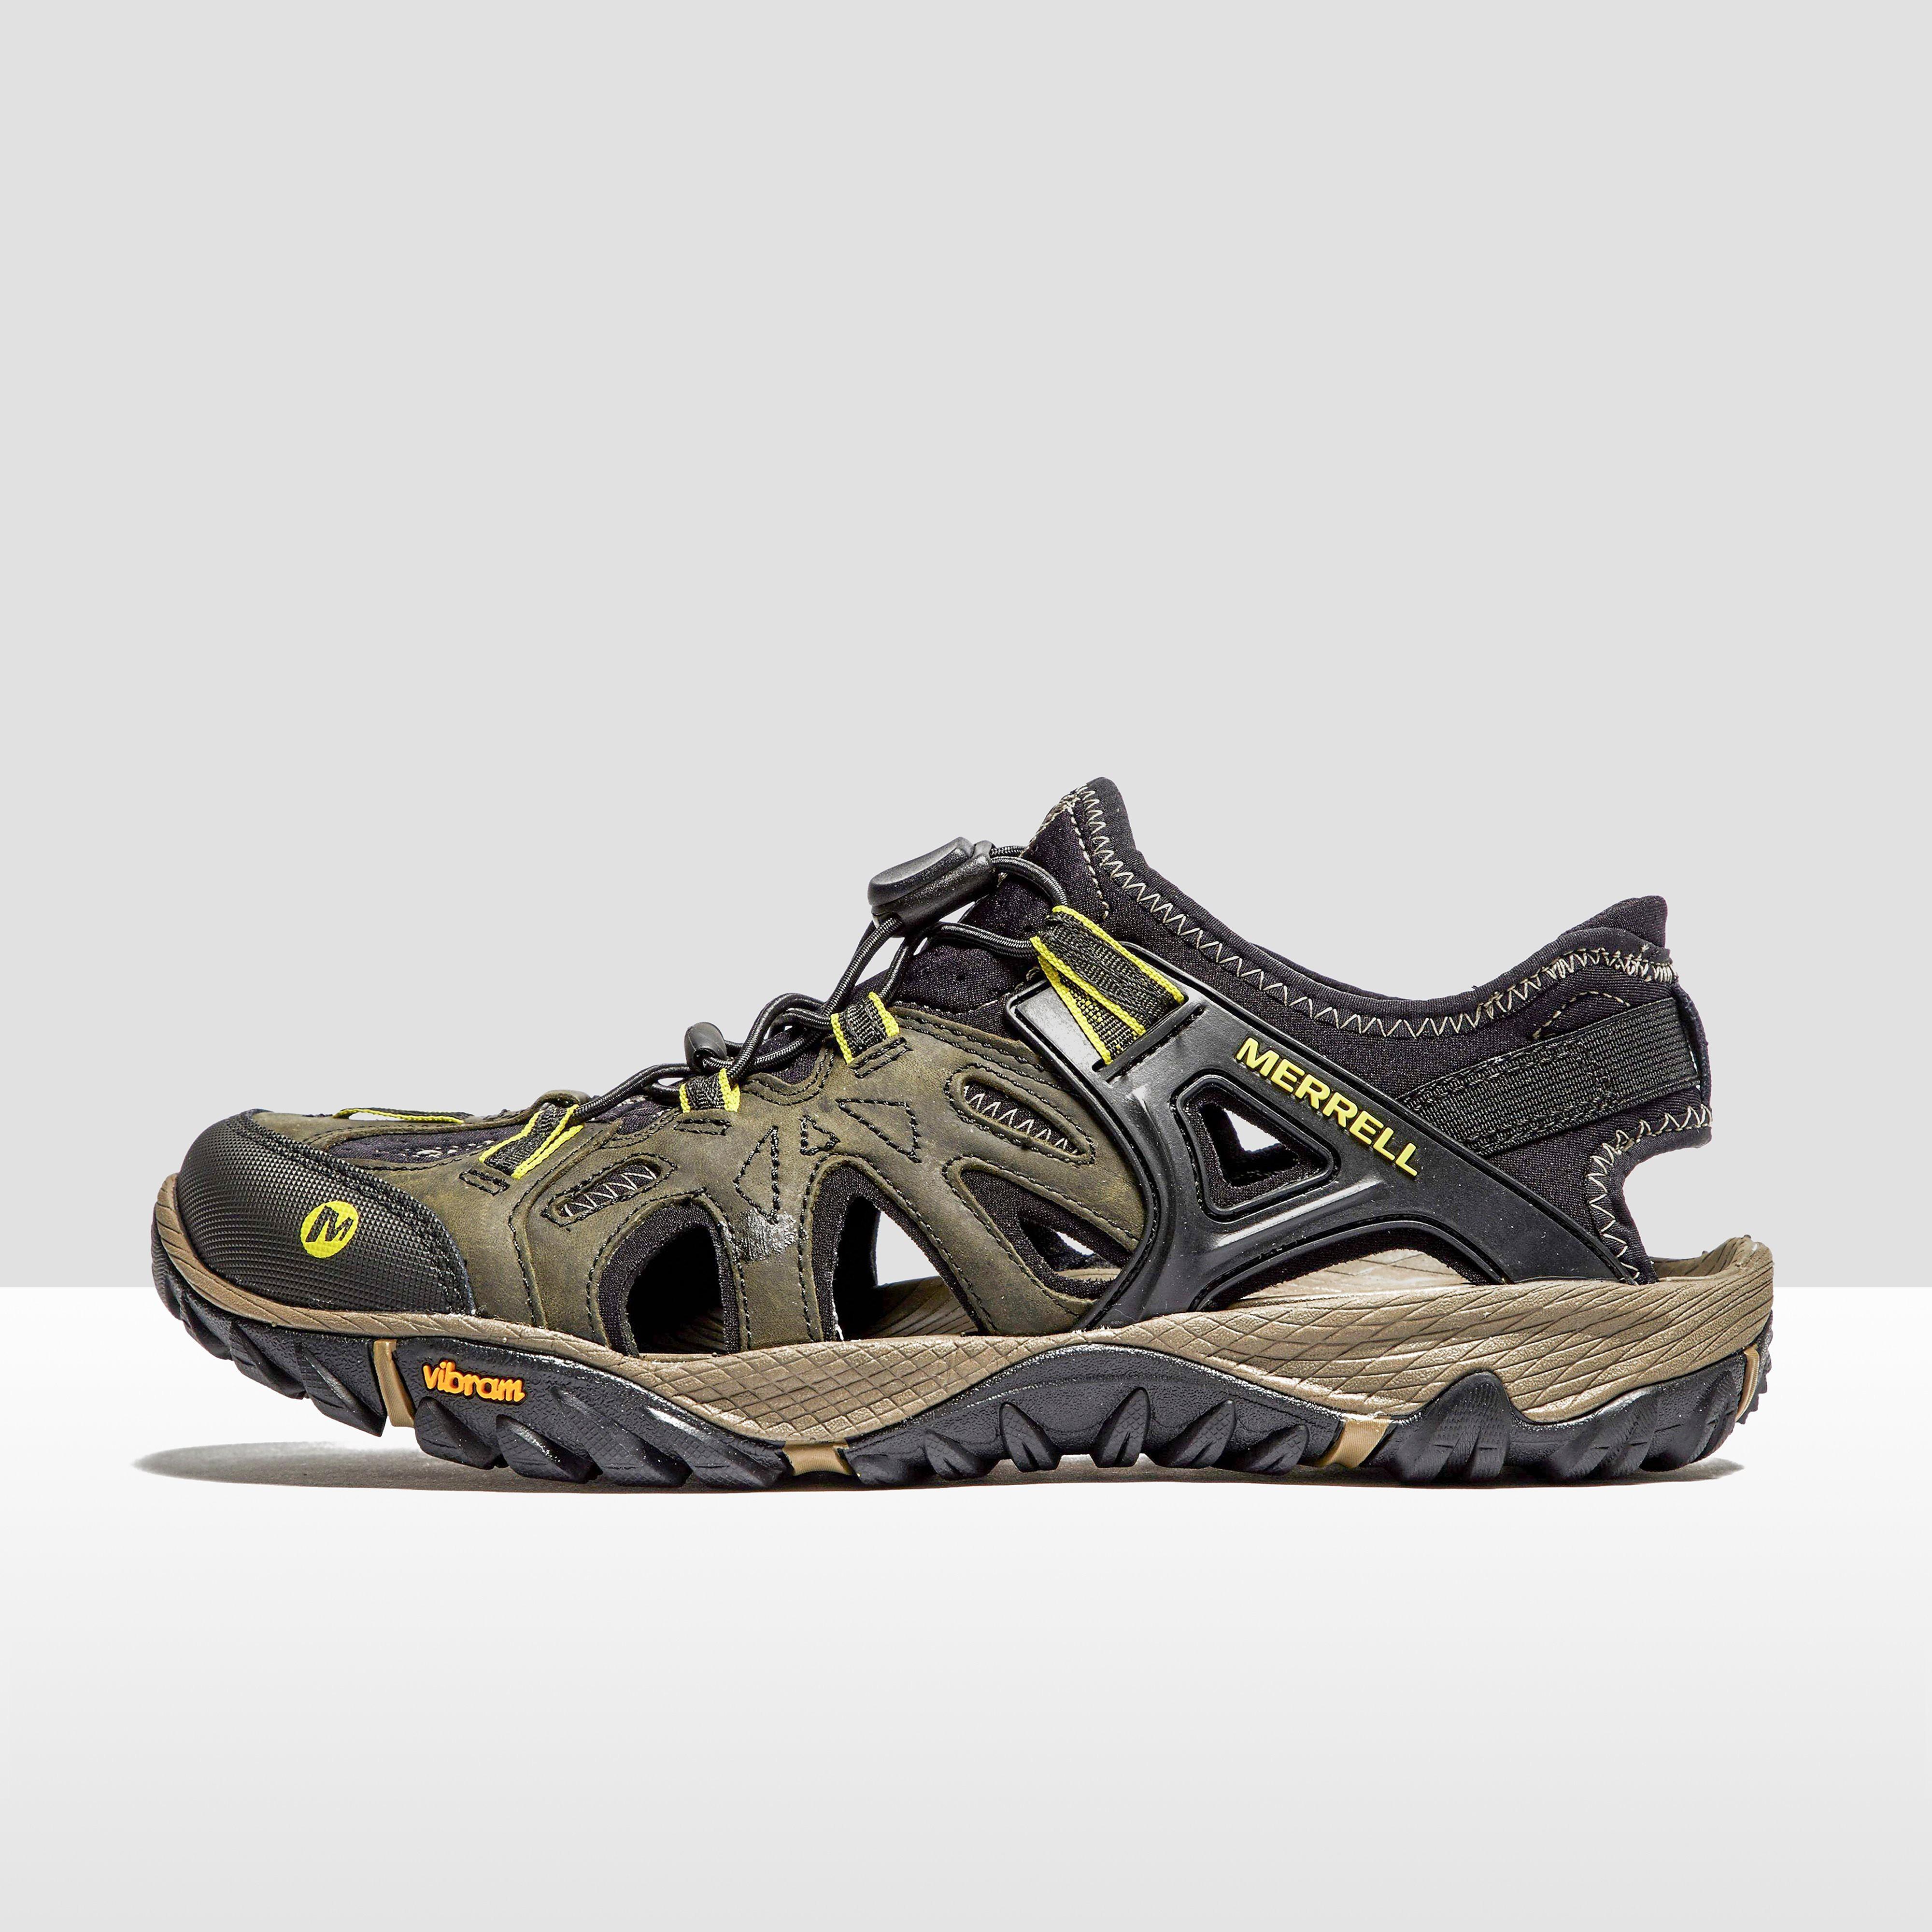 Merrell All Out Blaze Sieve Men's Hiking Sandals